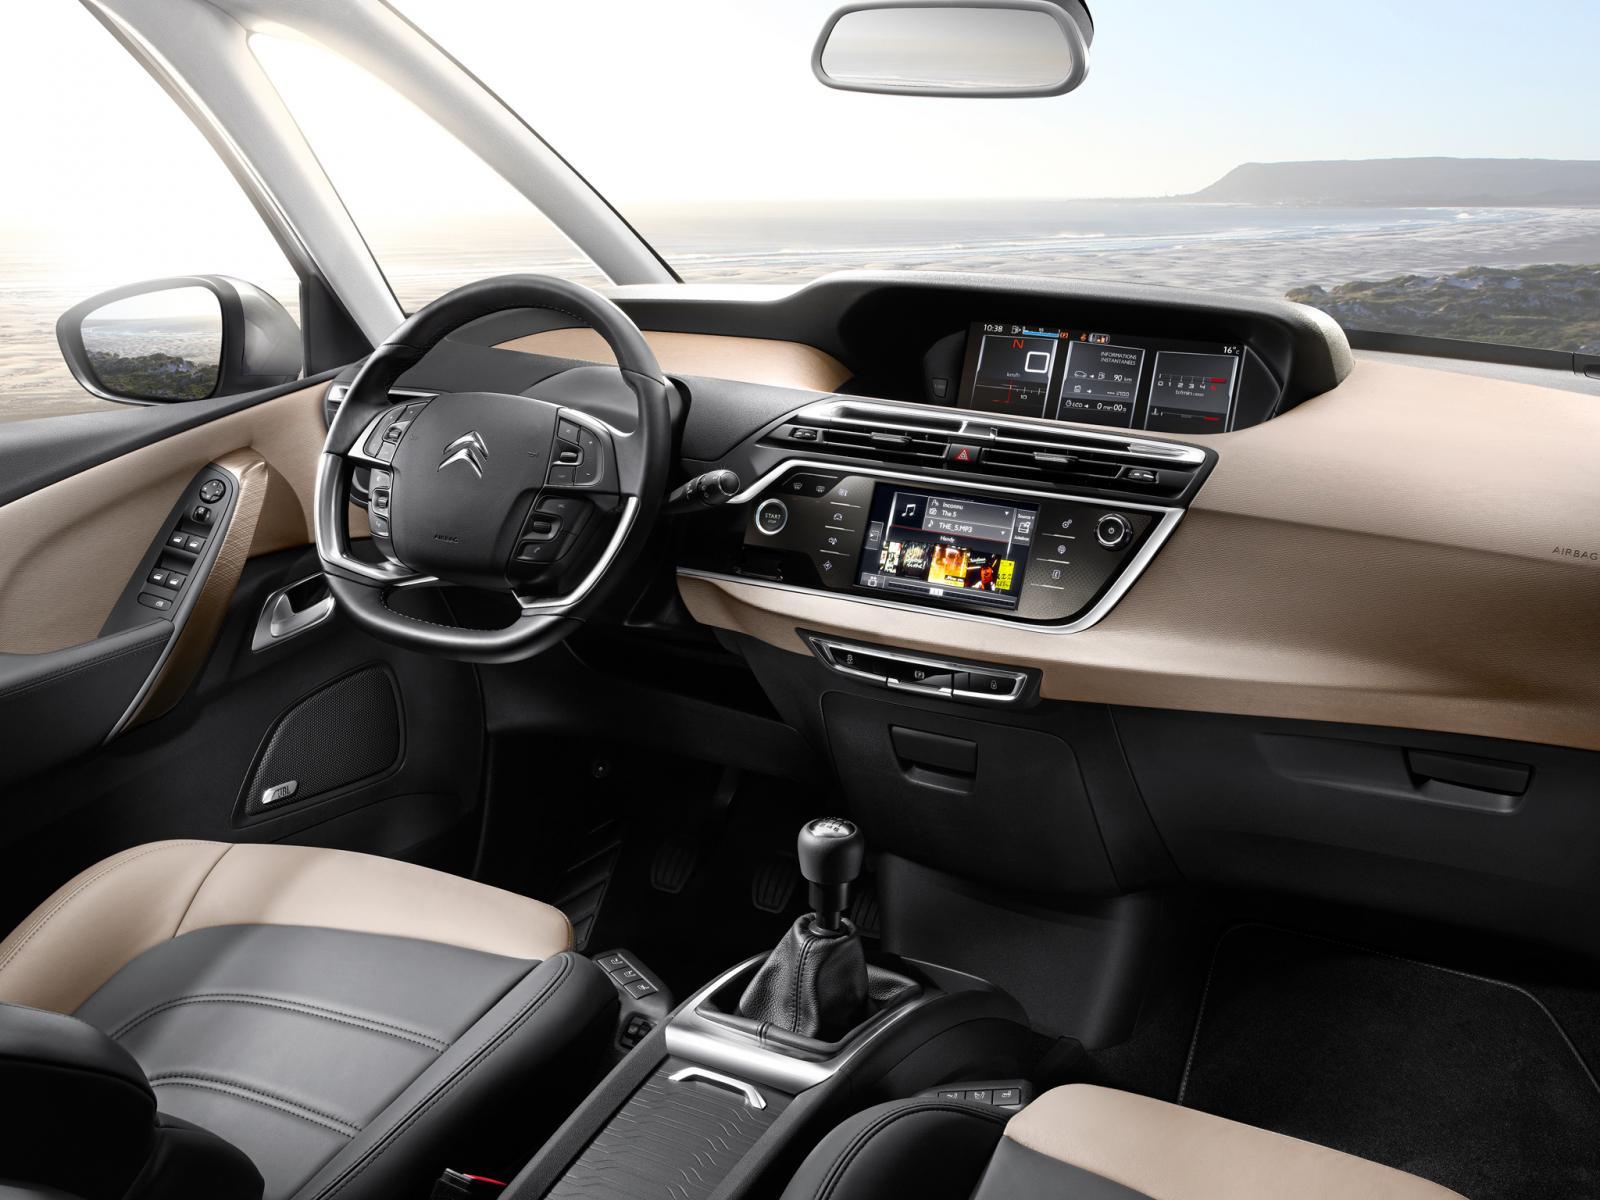 خودروی جدید سیتروئن با قابلیت شارژ شدن/عکس